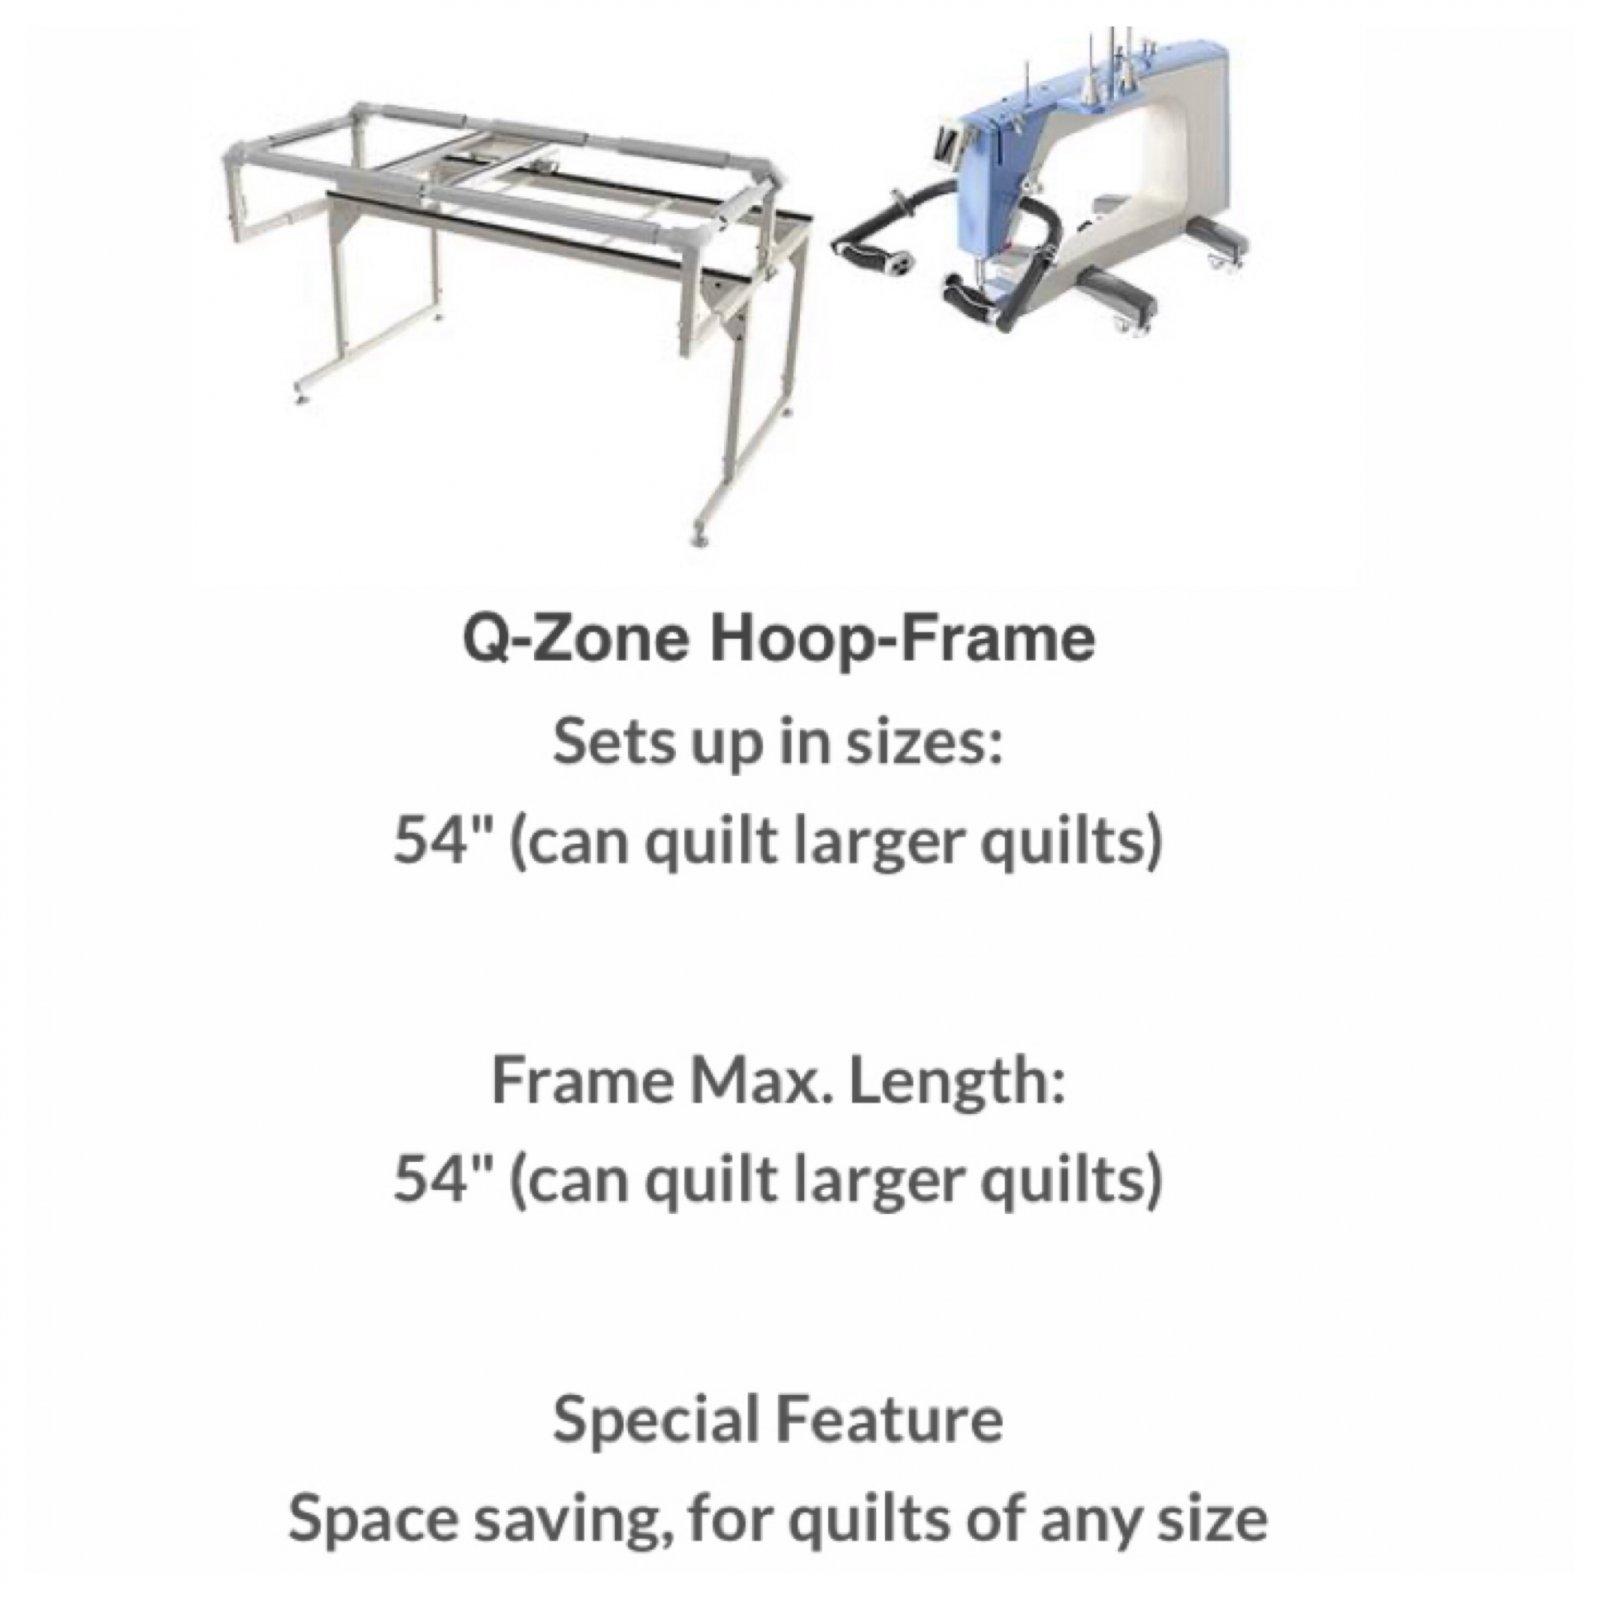 June Deal Q'nique 19 + Q-Zone Hoop Frame + FREE Light Bar